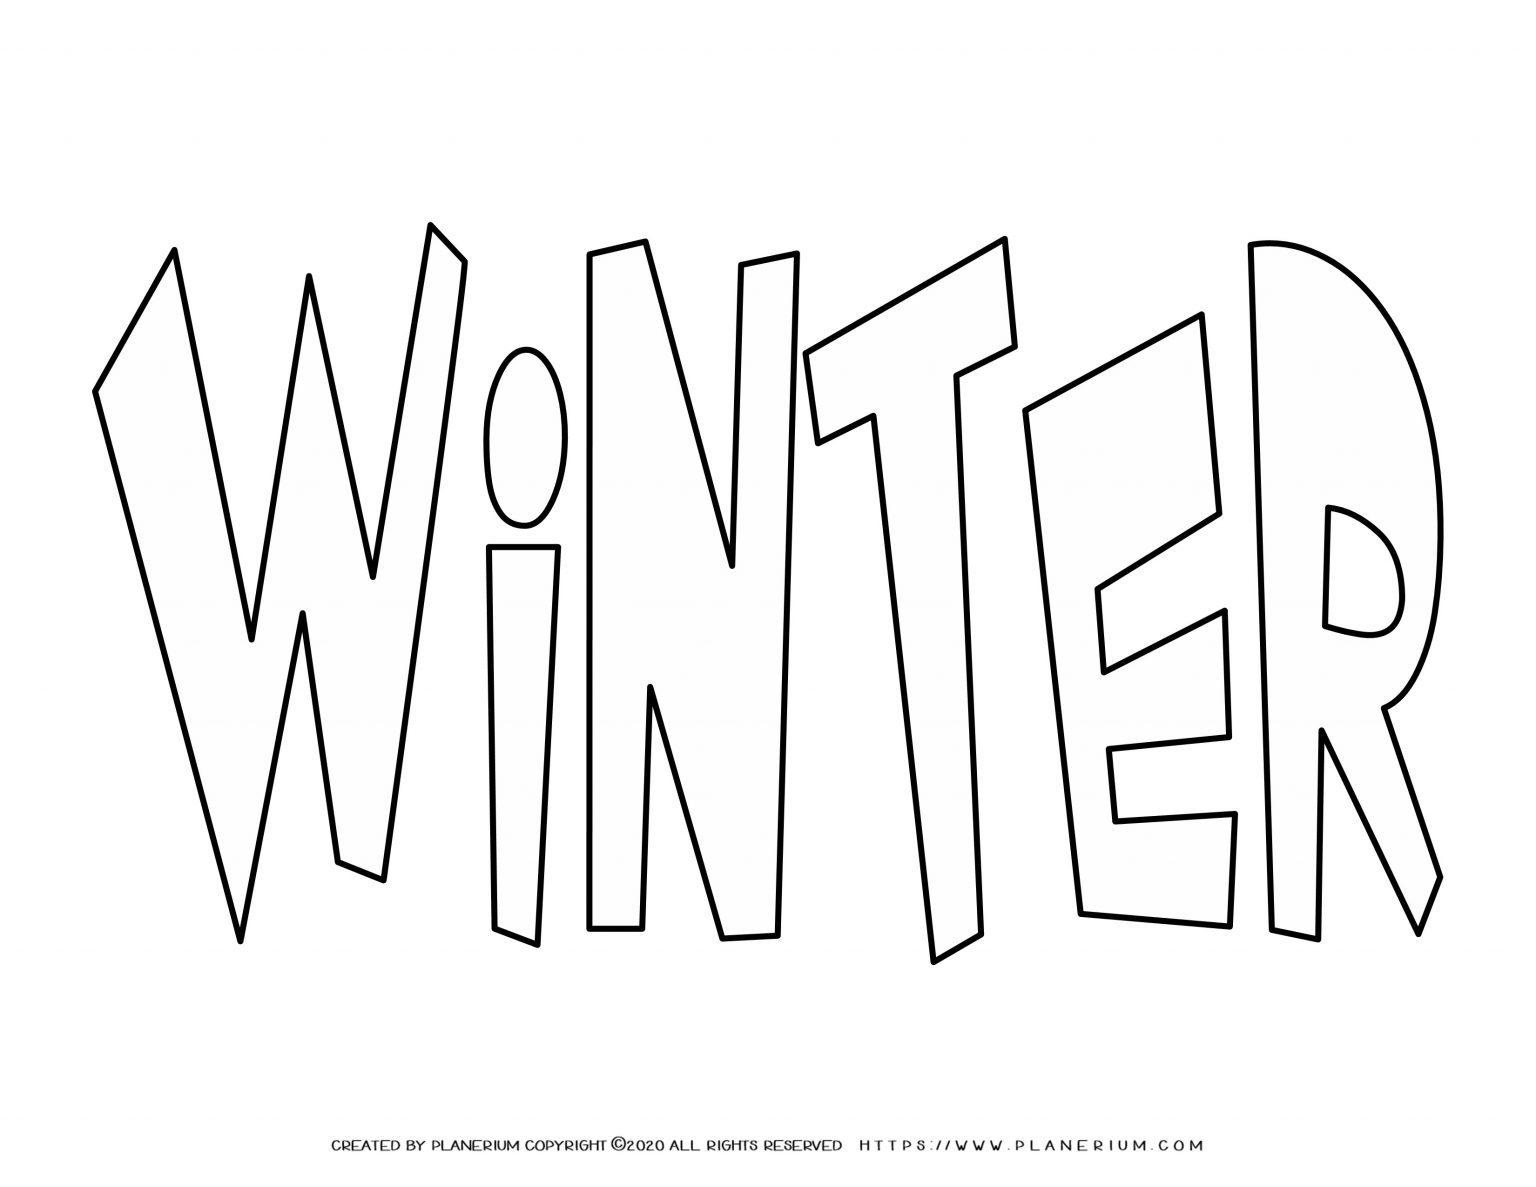 Winter Coloring Page - Large Title   Planerium